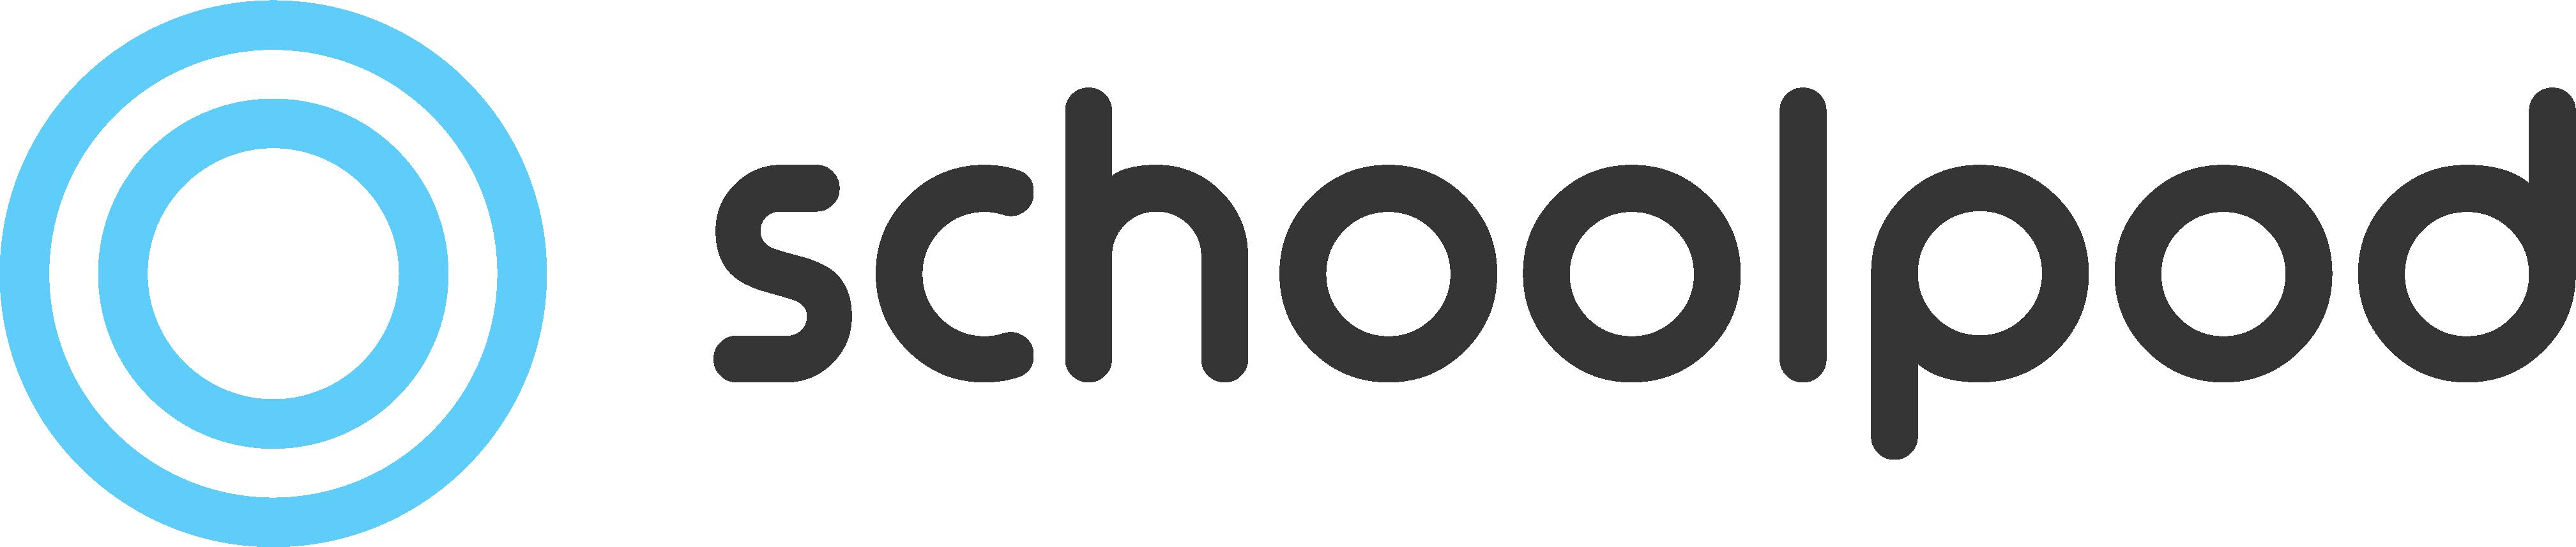 schoolpod - Groupcall integration partner